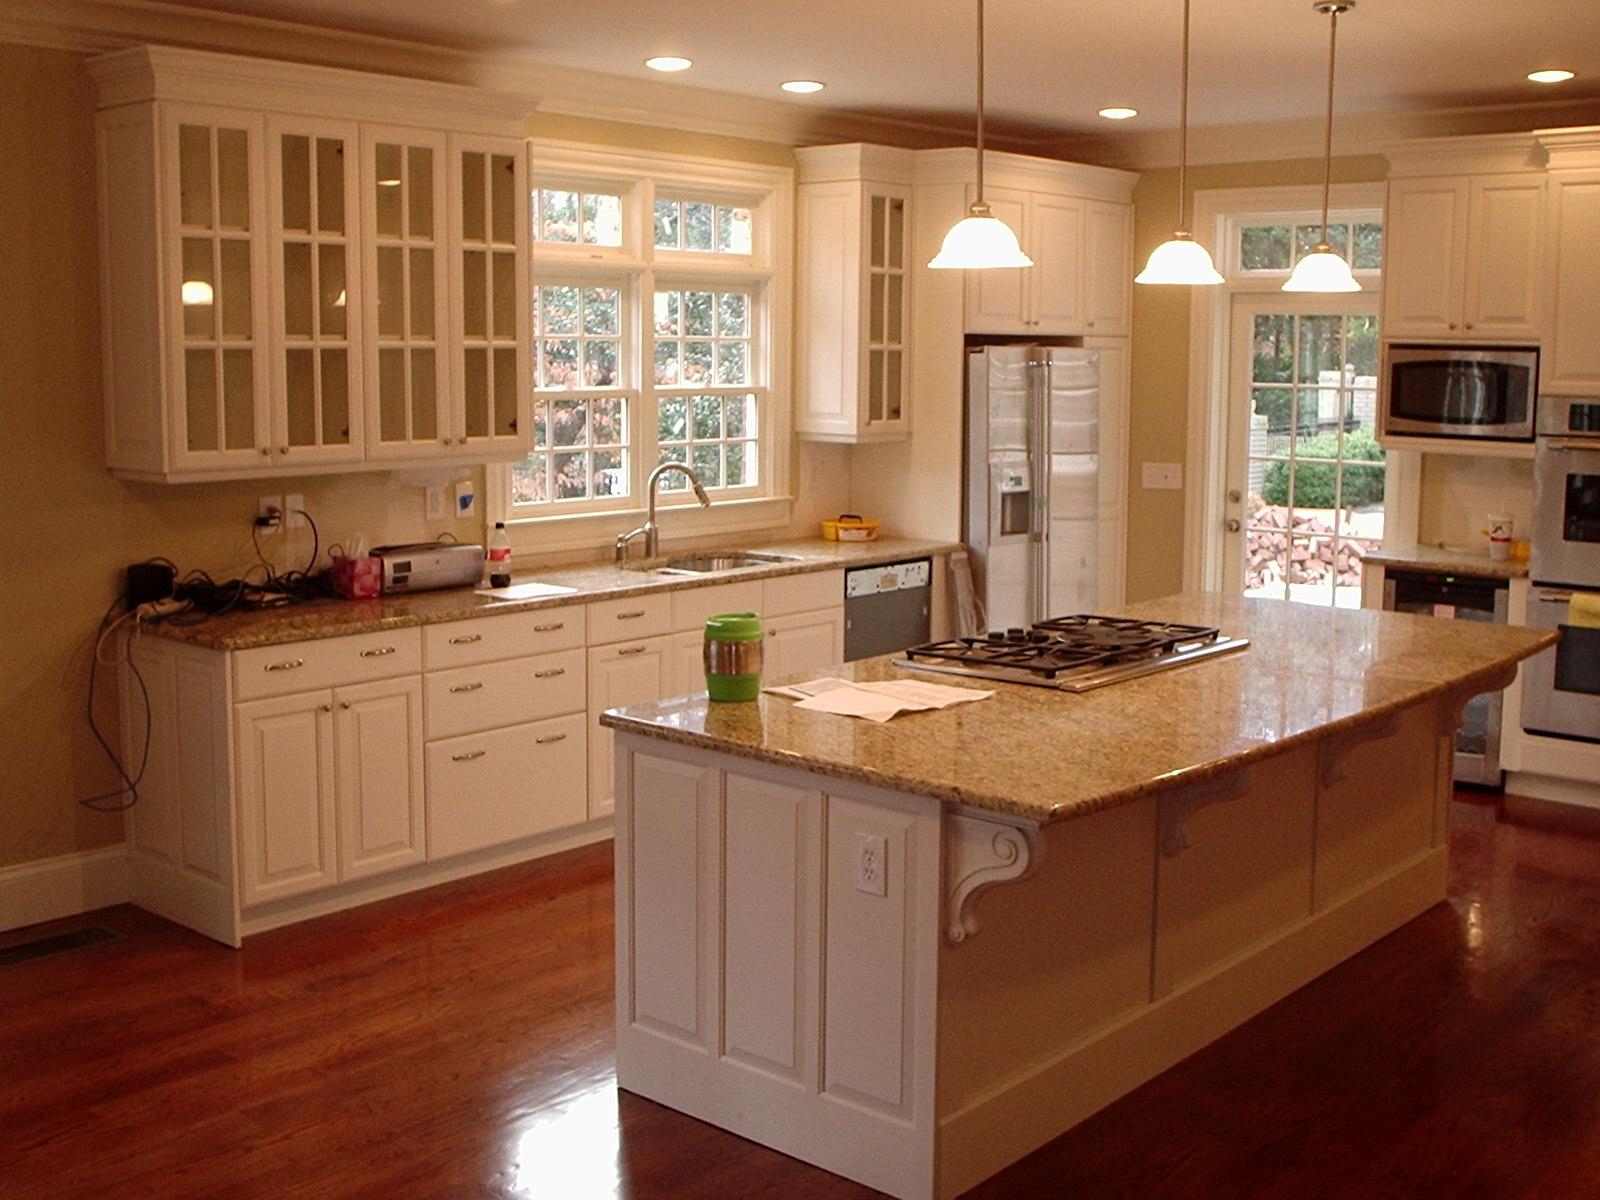 Cherry kitchen table set photo - 3